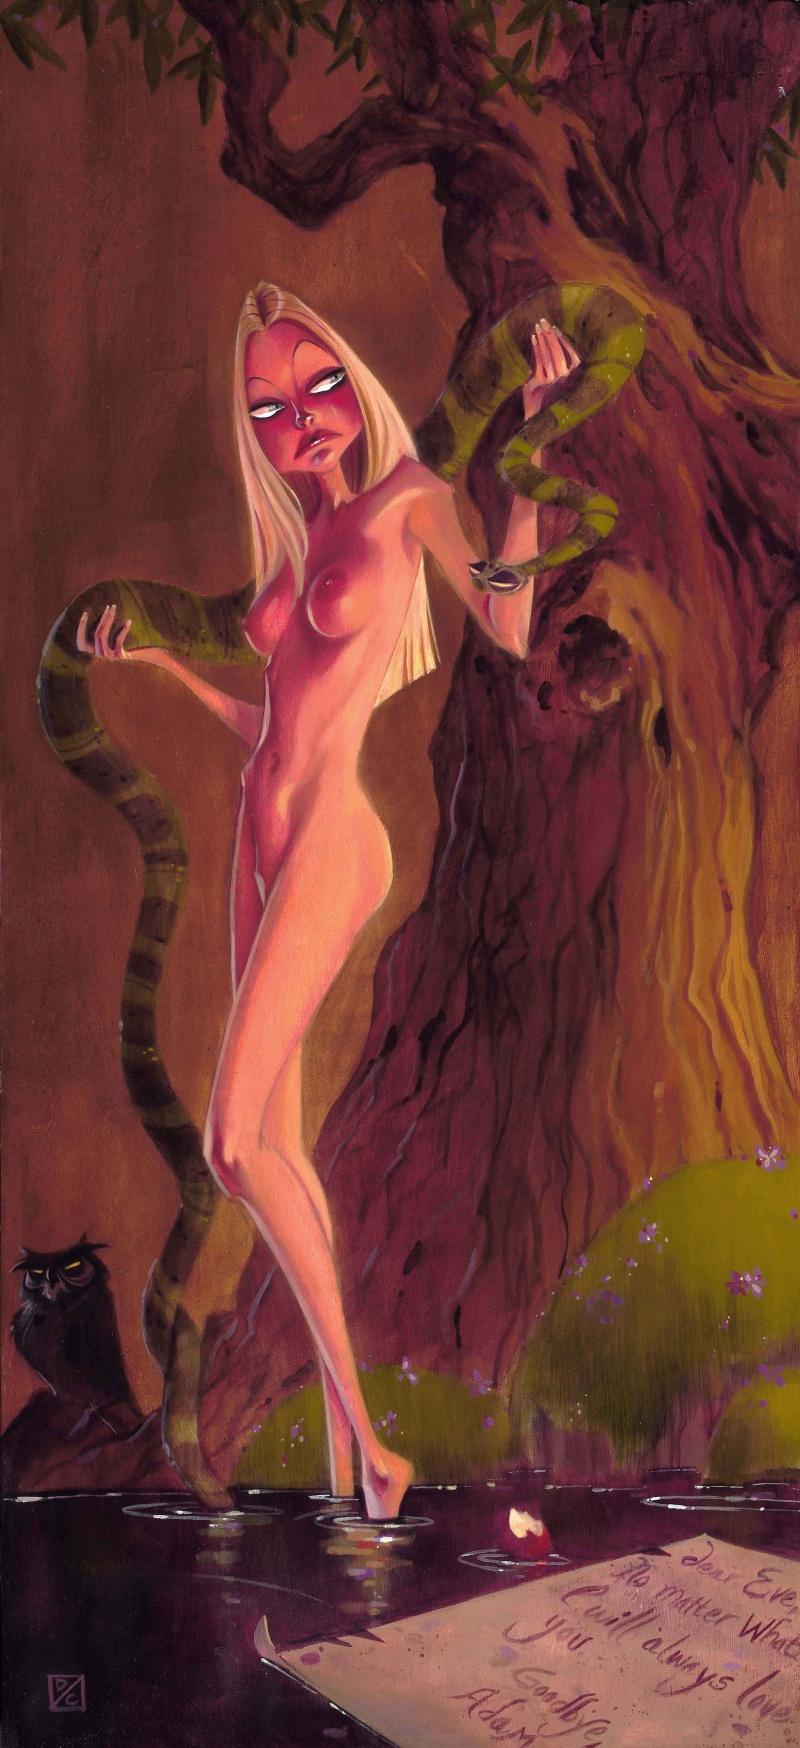 los angeles Oct 05, 2009 Devin Crane Eve Alone in the Garden of Eden